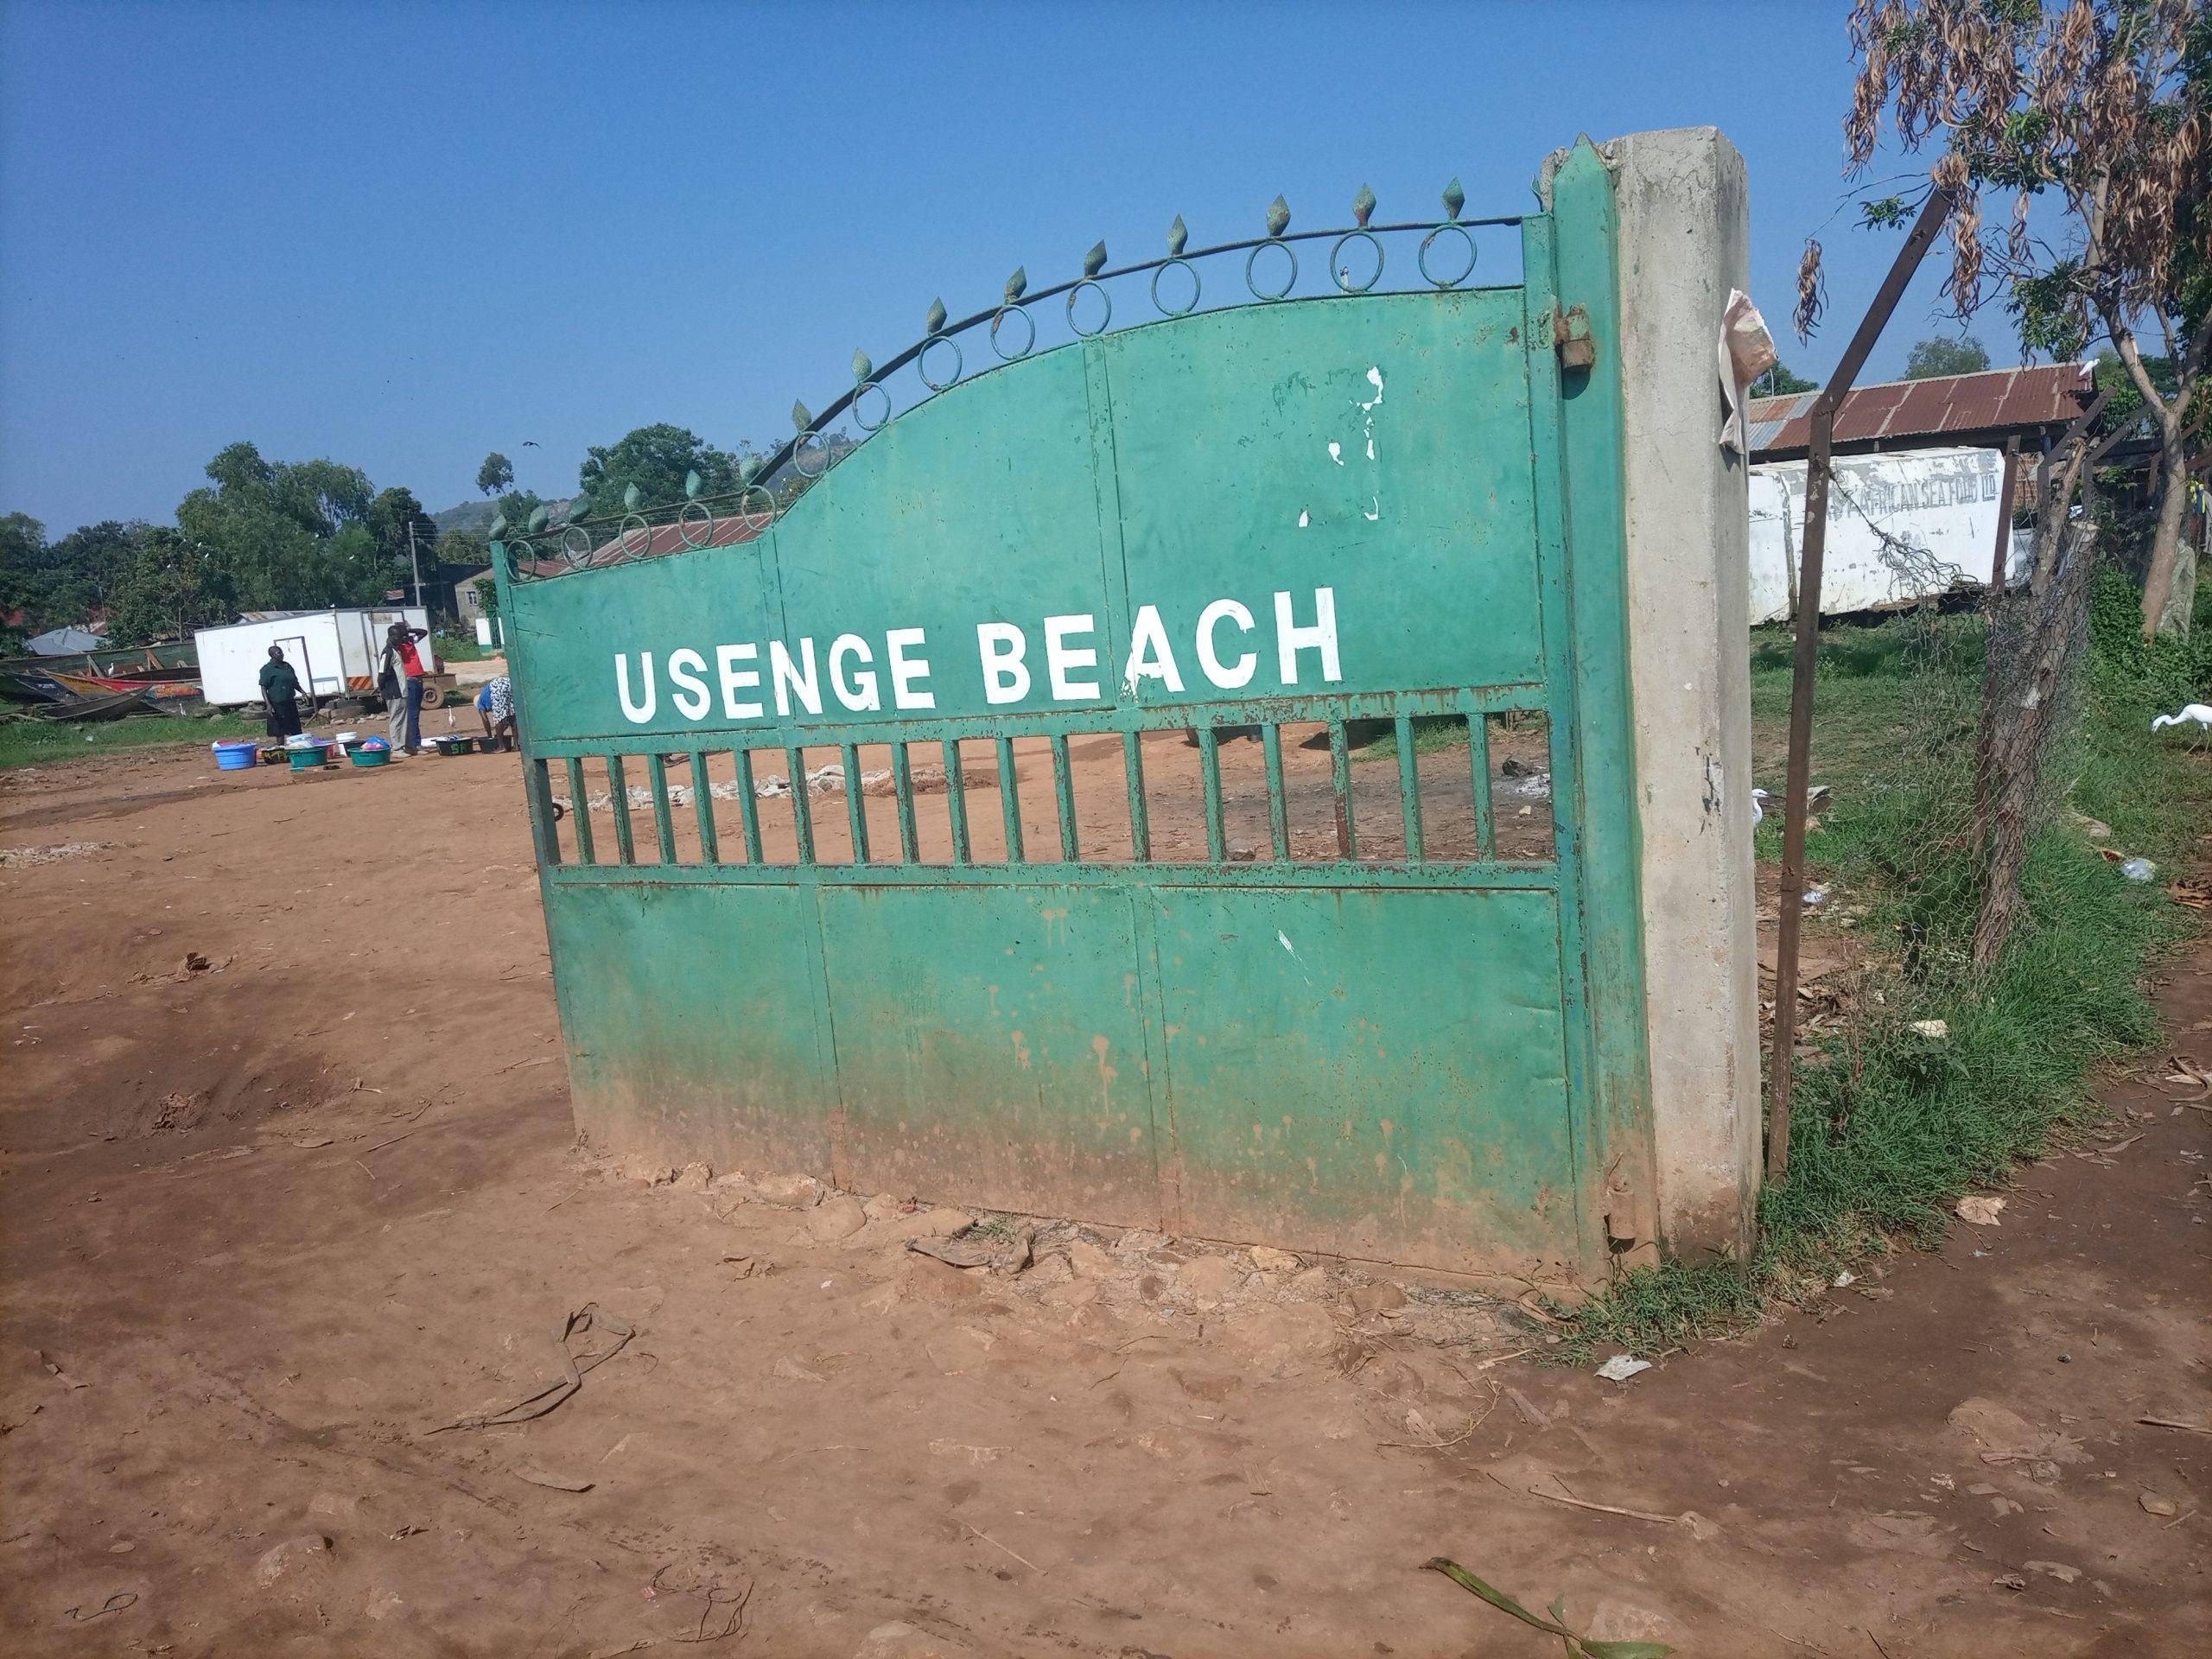 Usenge, a beach choked by plastic